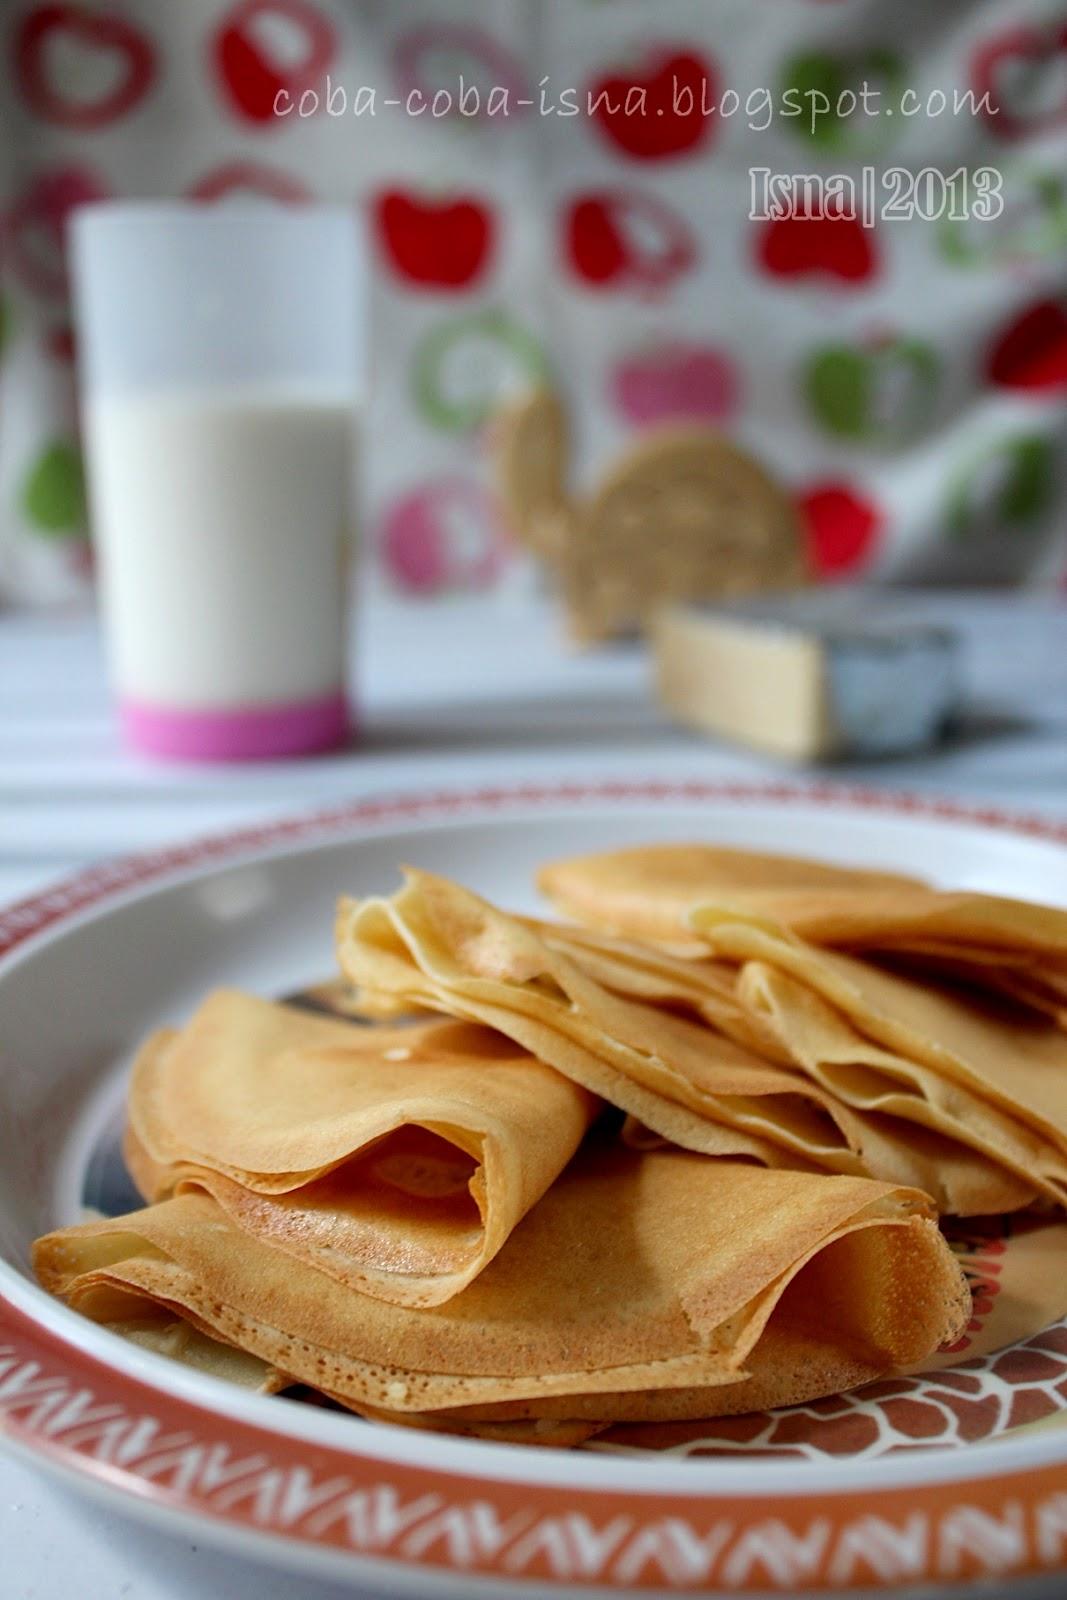 Cara Membuat Crepes Dengan Teflon : membuat, crepes, dengan, teflon, Coba-Coba, Yuk.....:, CREPES, STRAWBERRY